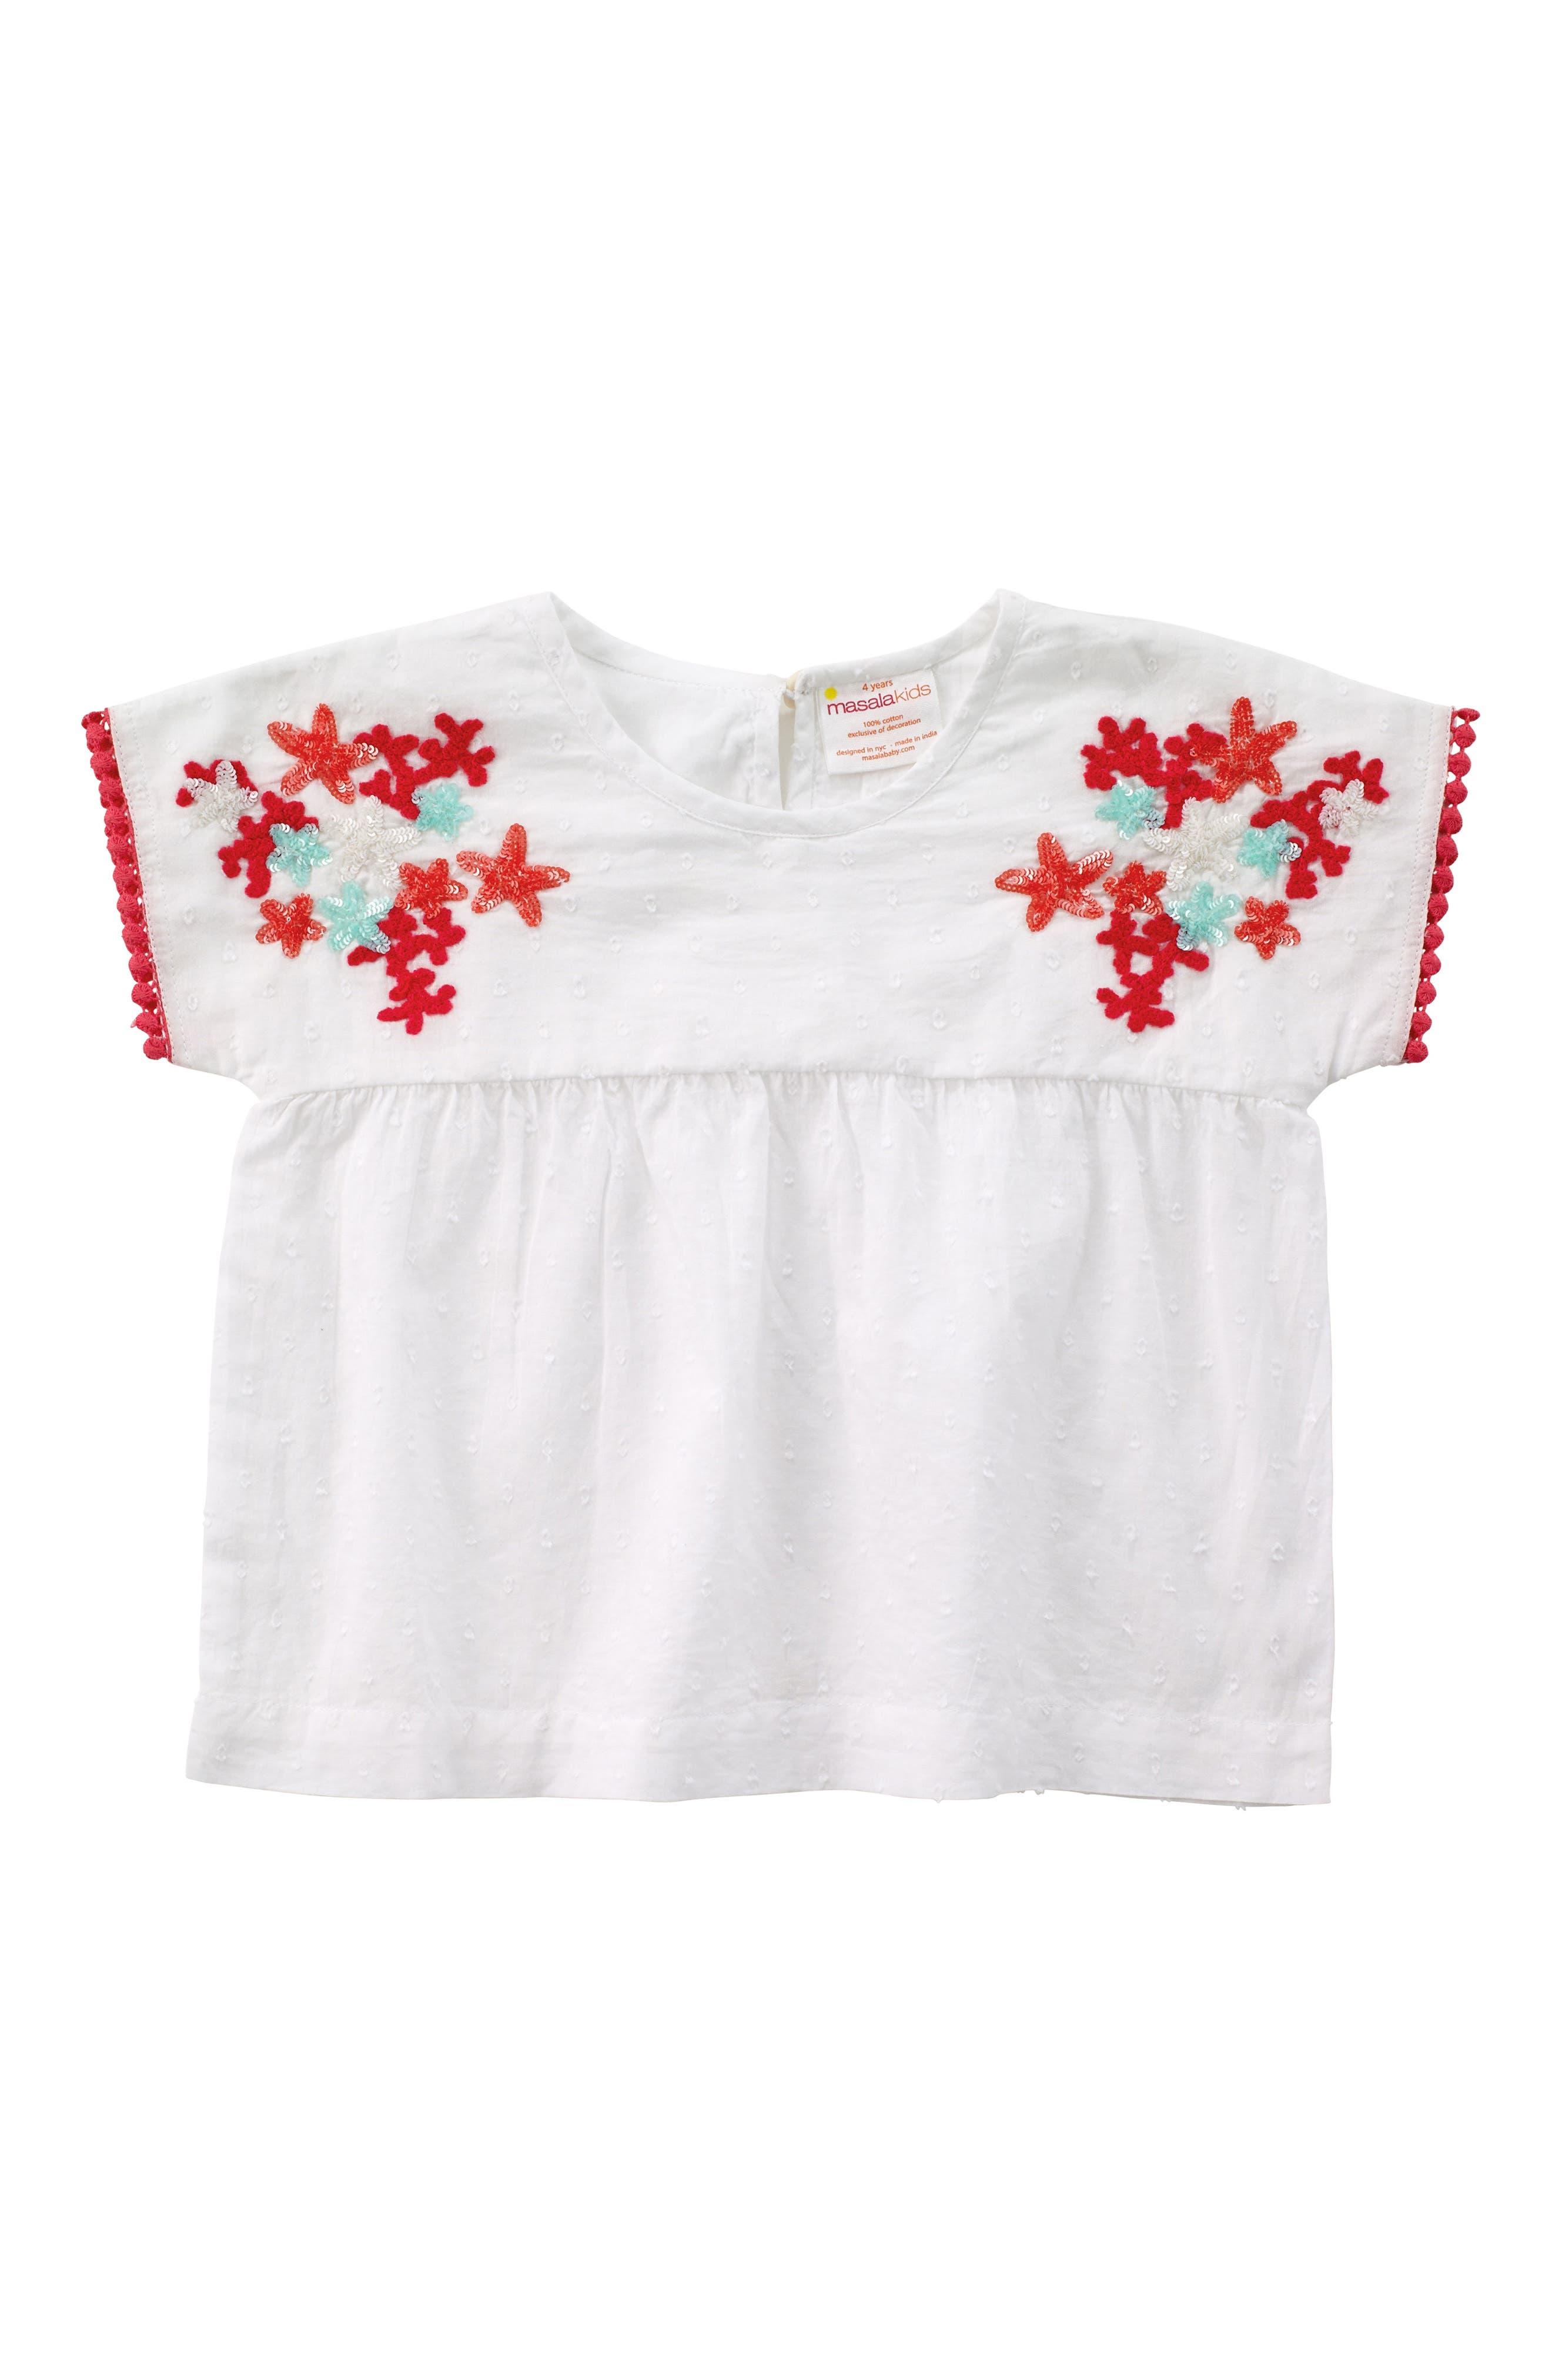 Main Image - Masalababy Kumari Embroidered Top (Toddler Girls, Little Girls & Big Girls)